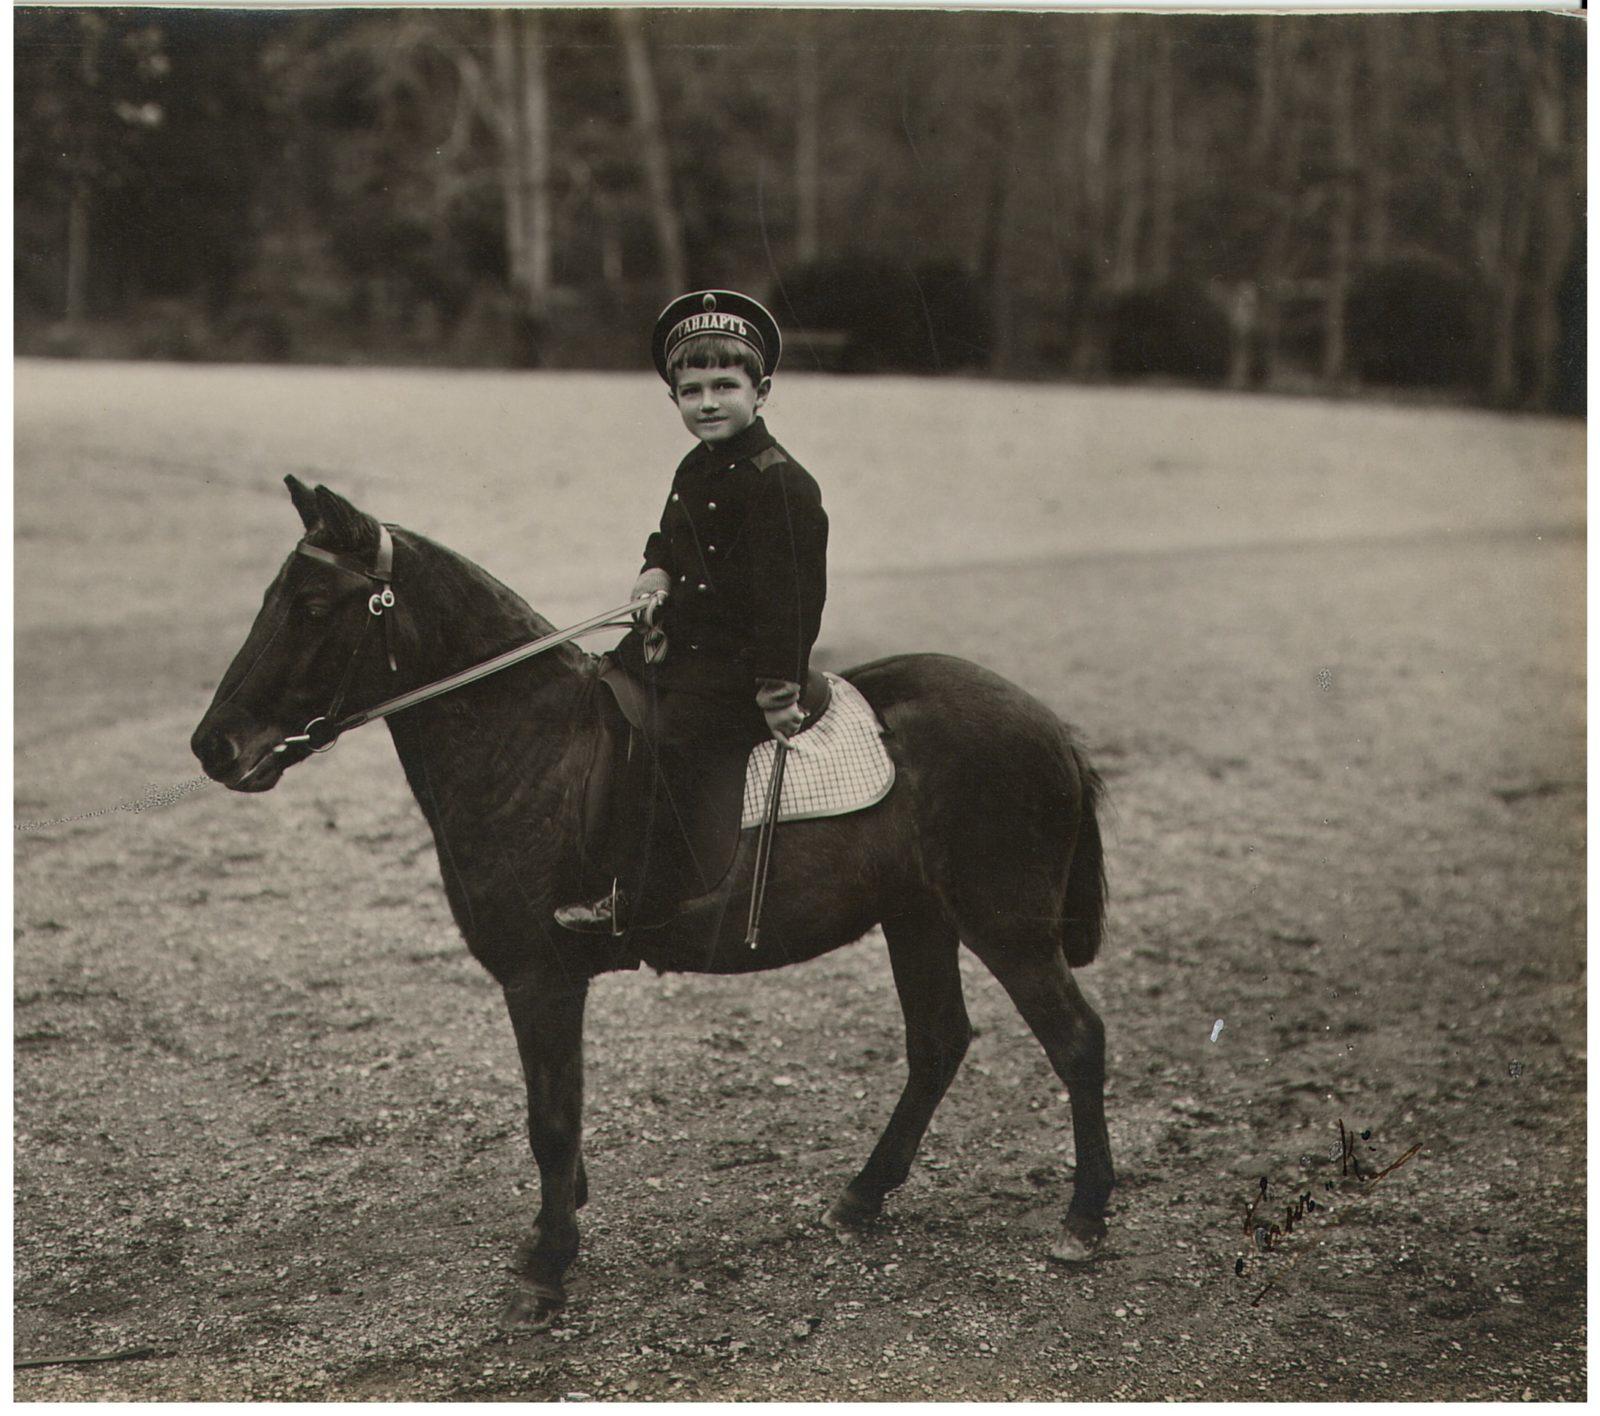 Tsarevich Alexey Nikolayevich is riding a pony.